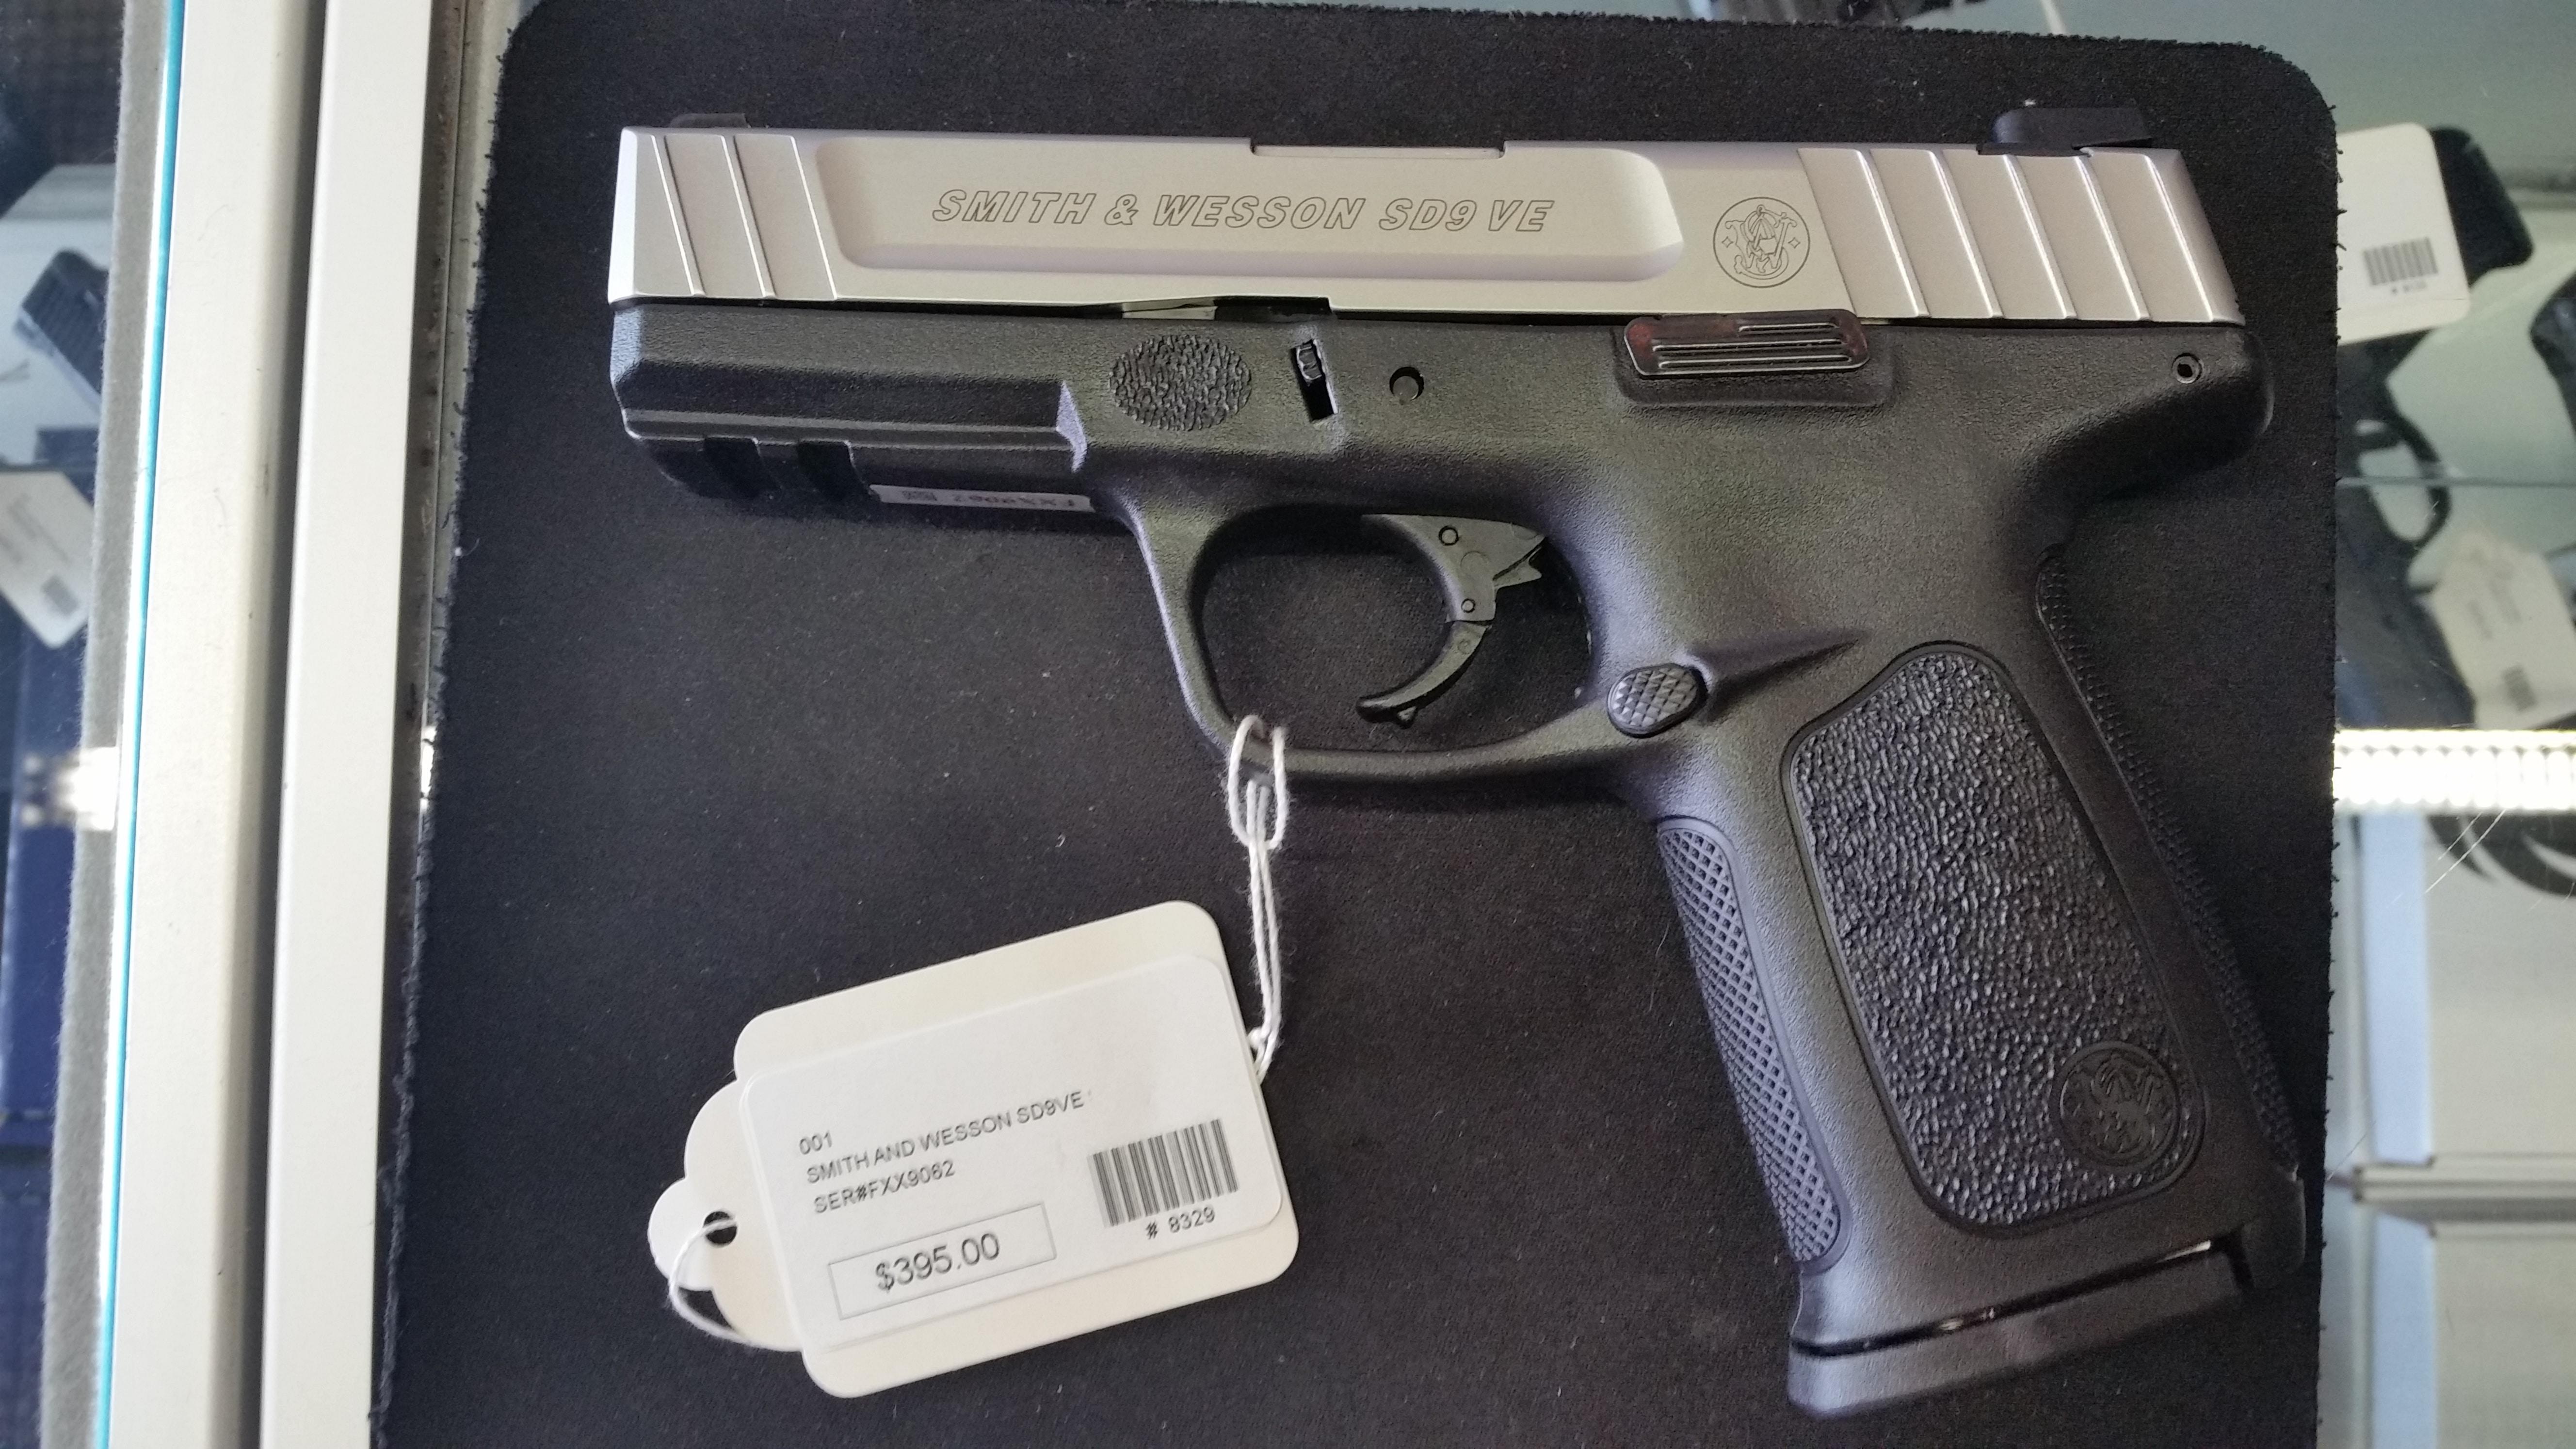 Smith & Wesson SD9 VE Review – Self Defense Value Enhanced